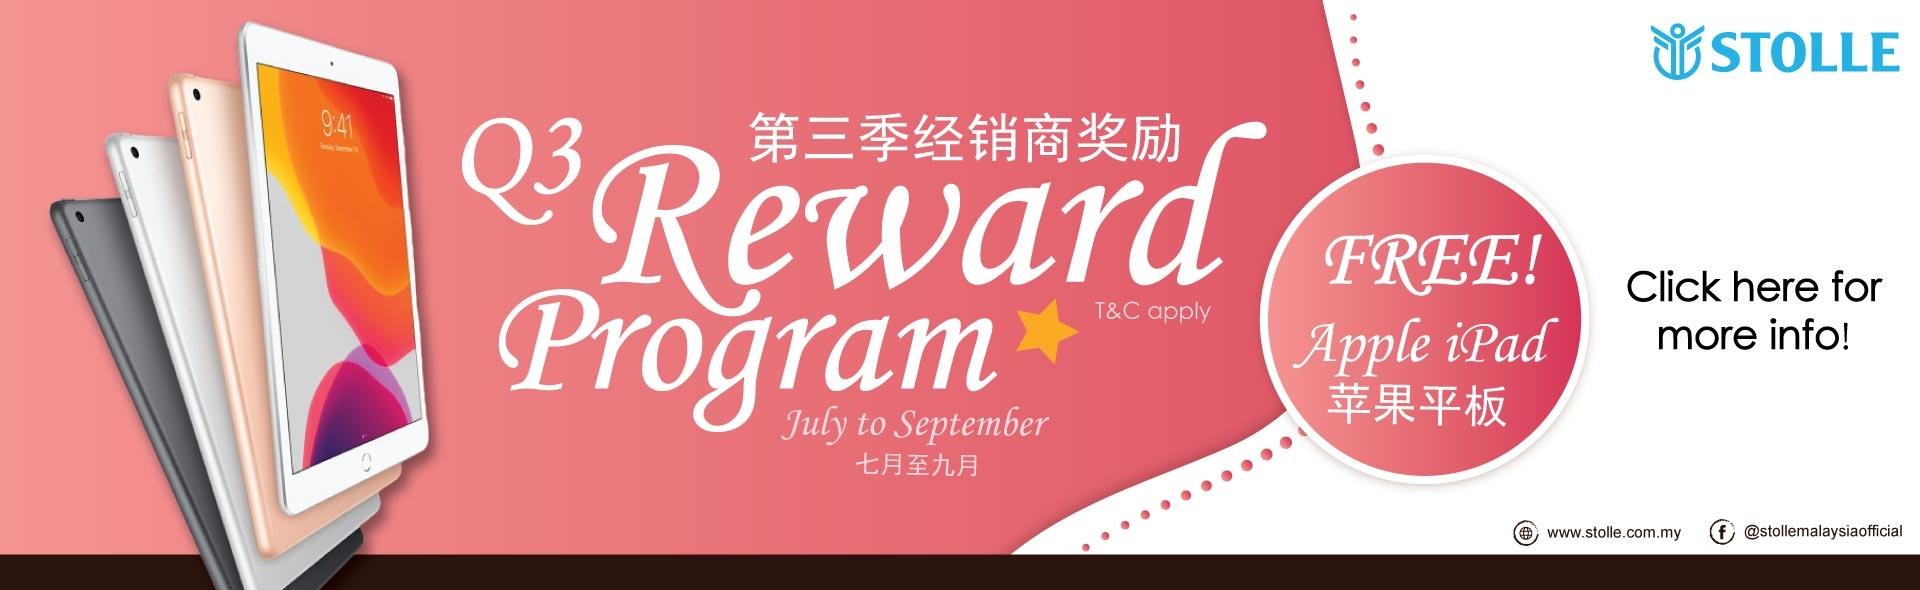 Q3 Distributors Rewards